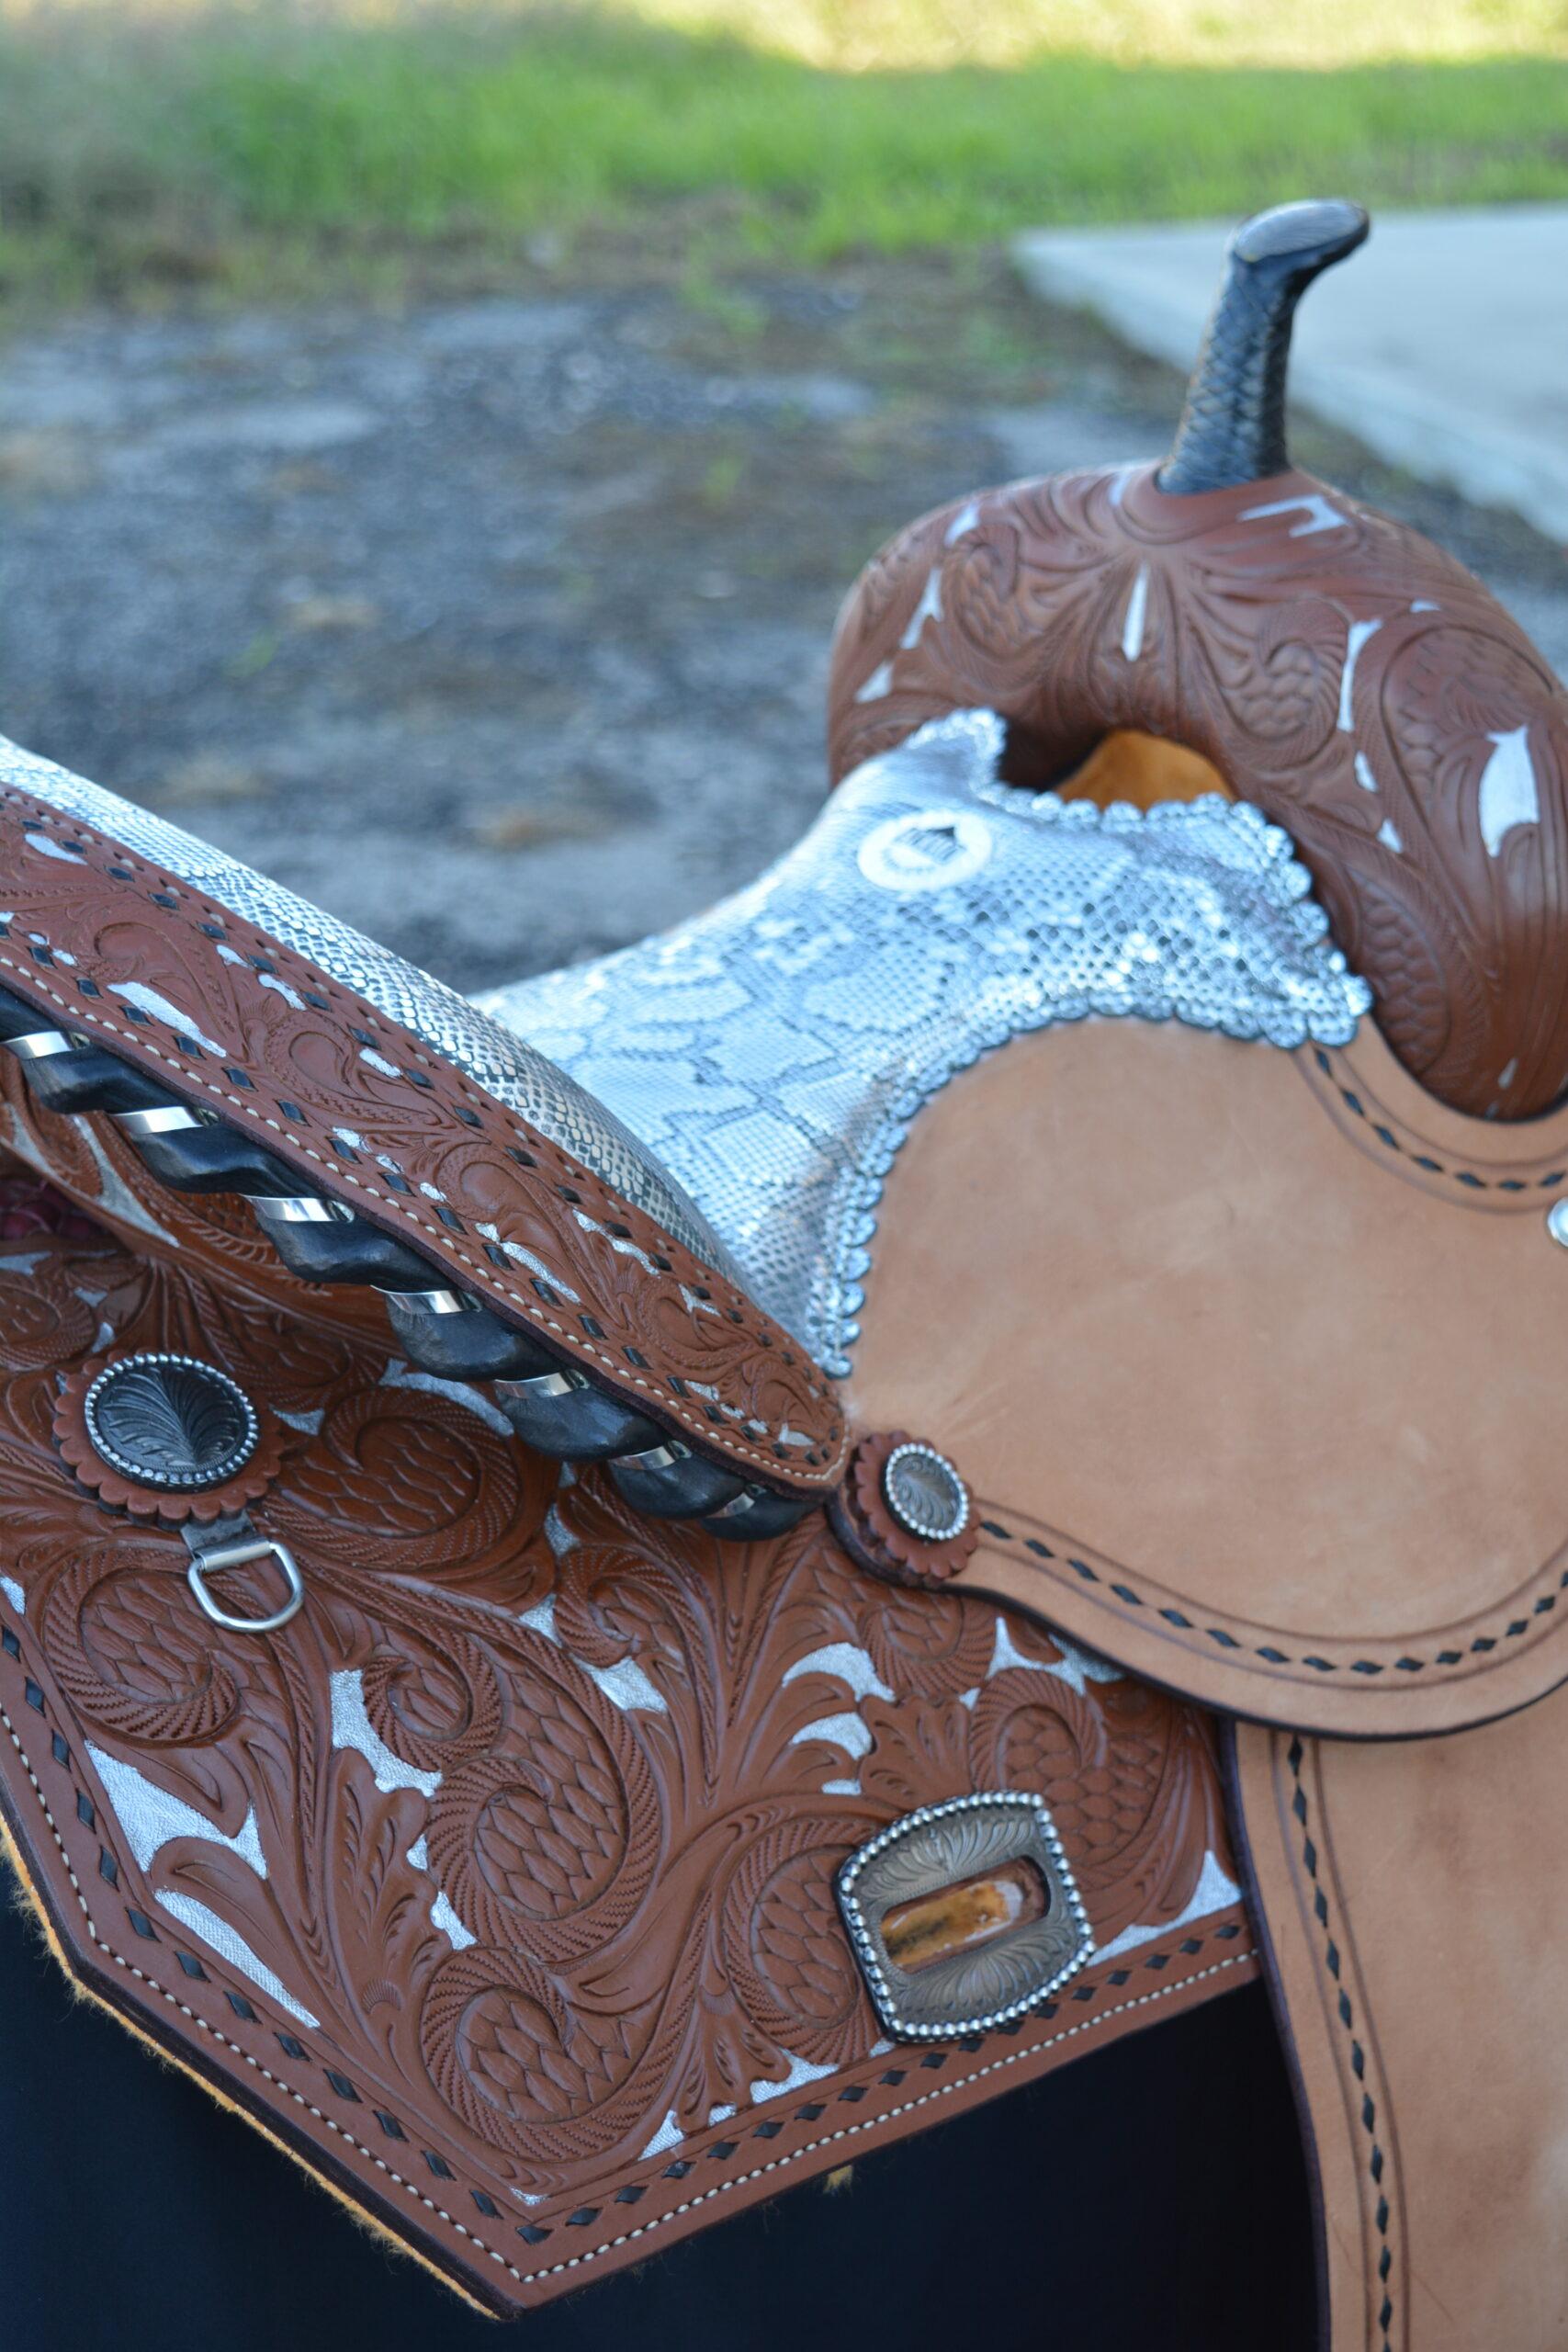 <p><b>PRE-ORDER ONLY</b></p> Python seat toast leather barrel saddle